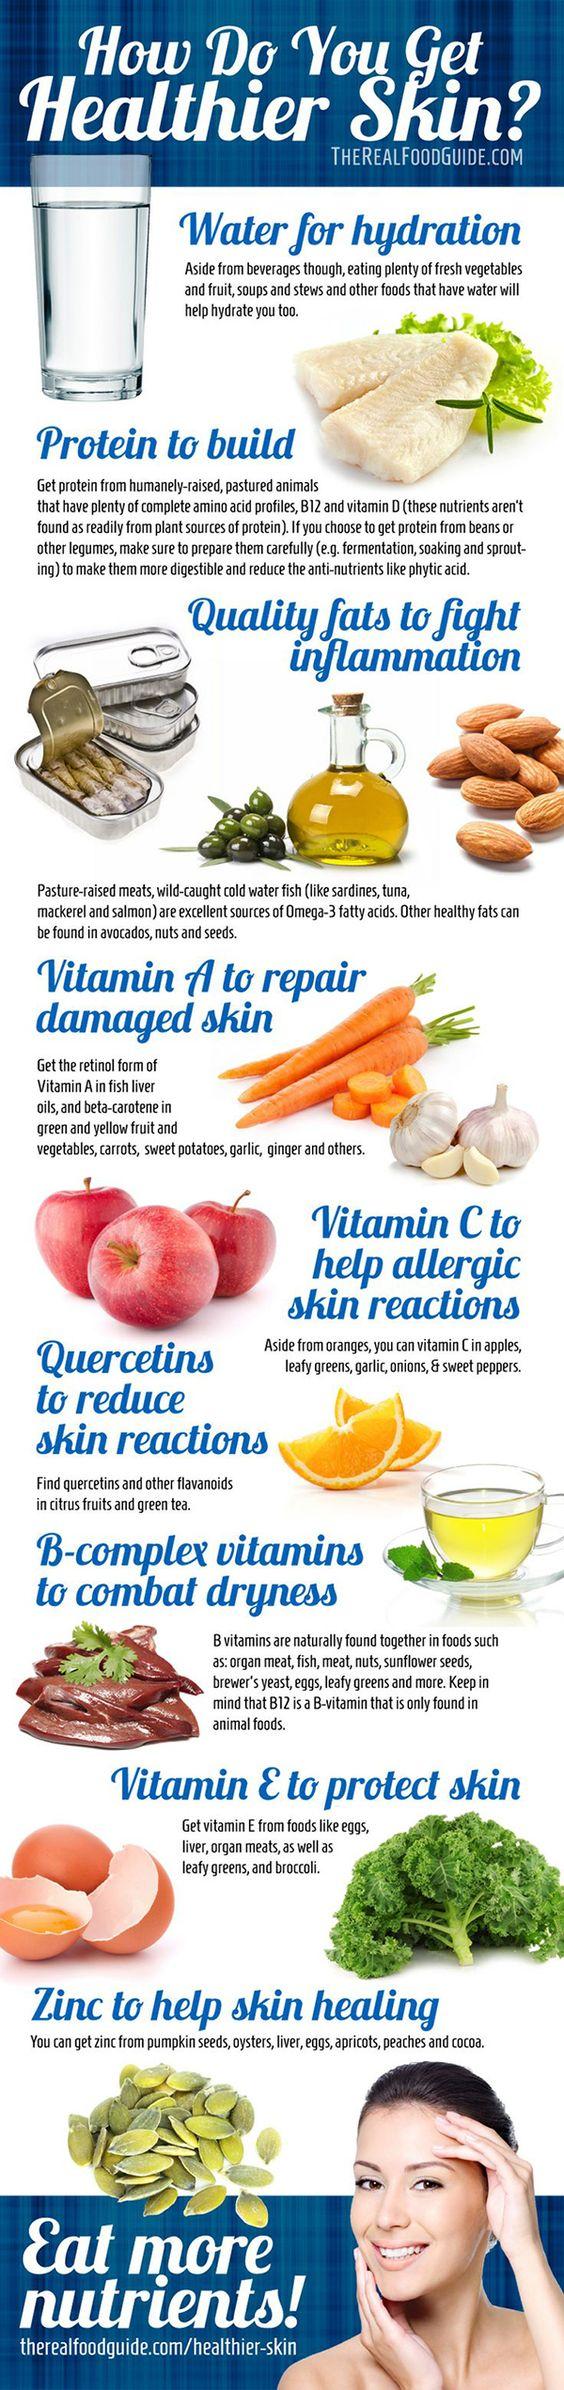 15 Skin Care Tips and Tricks For Better, Healthier Skin   Gurl.com